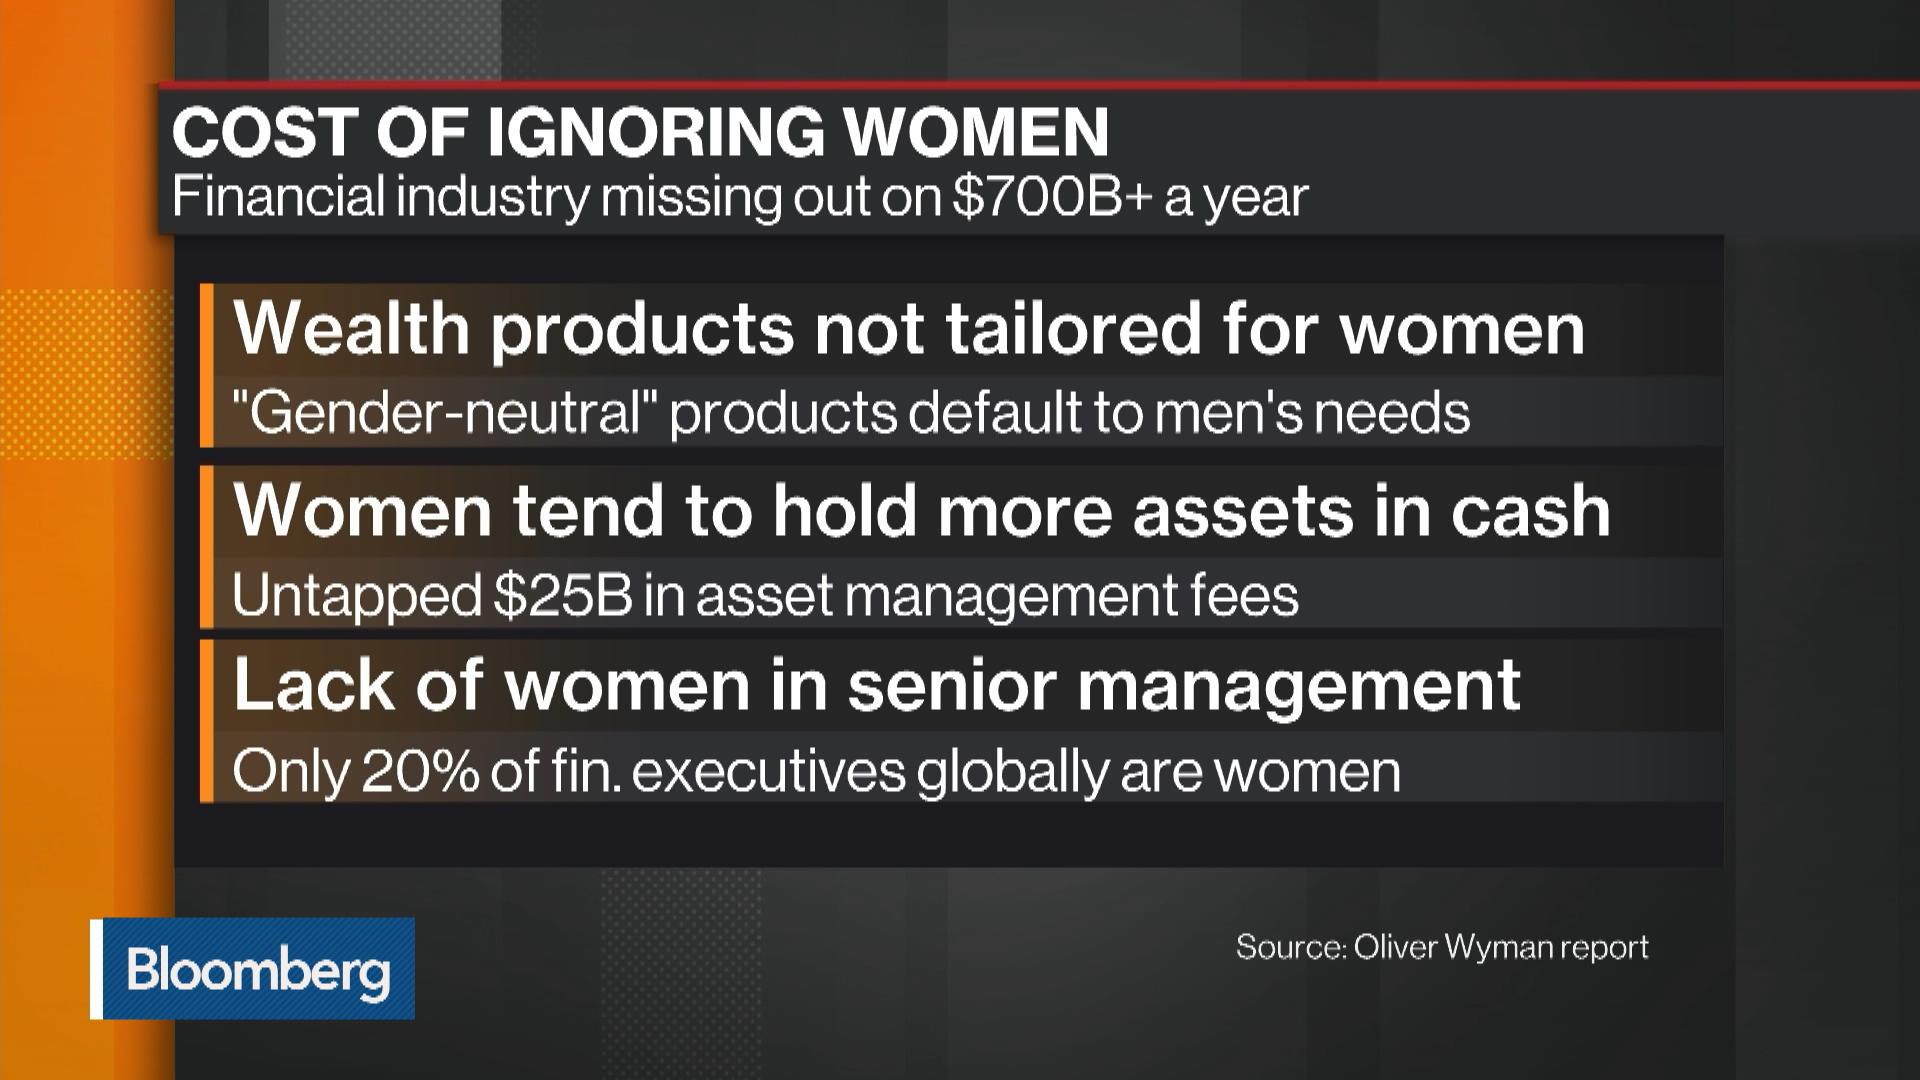 Ignoring Women Costs Financial Industry $700 Billion a Year